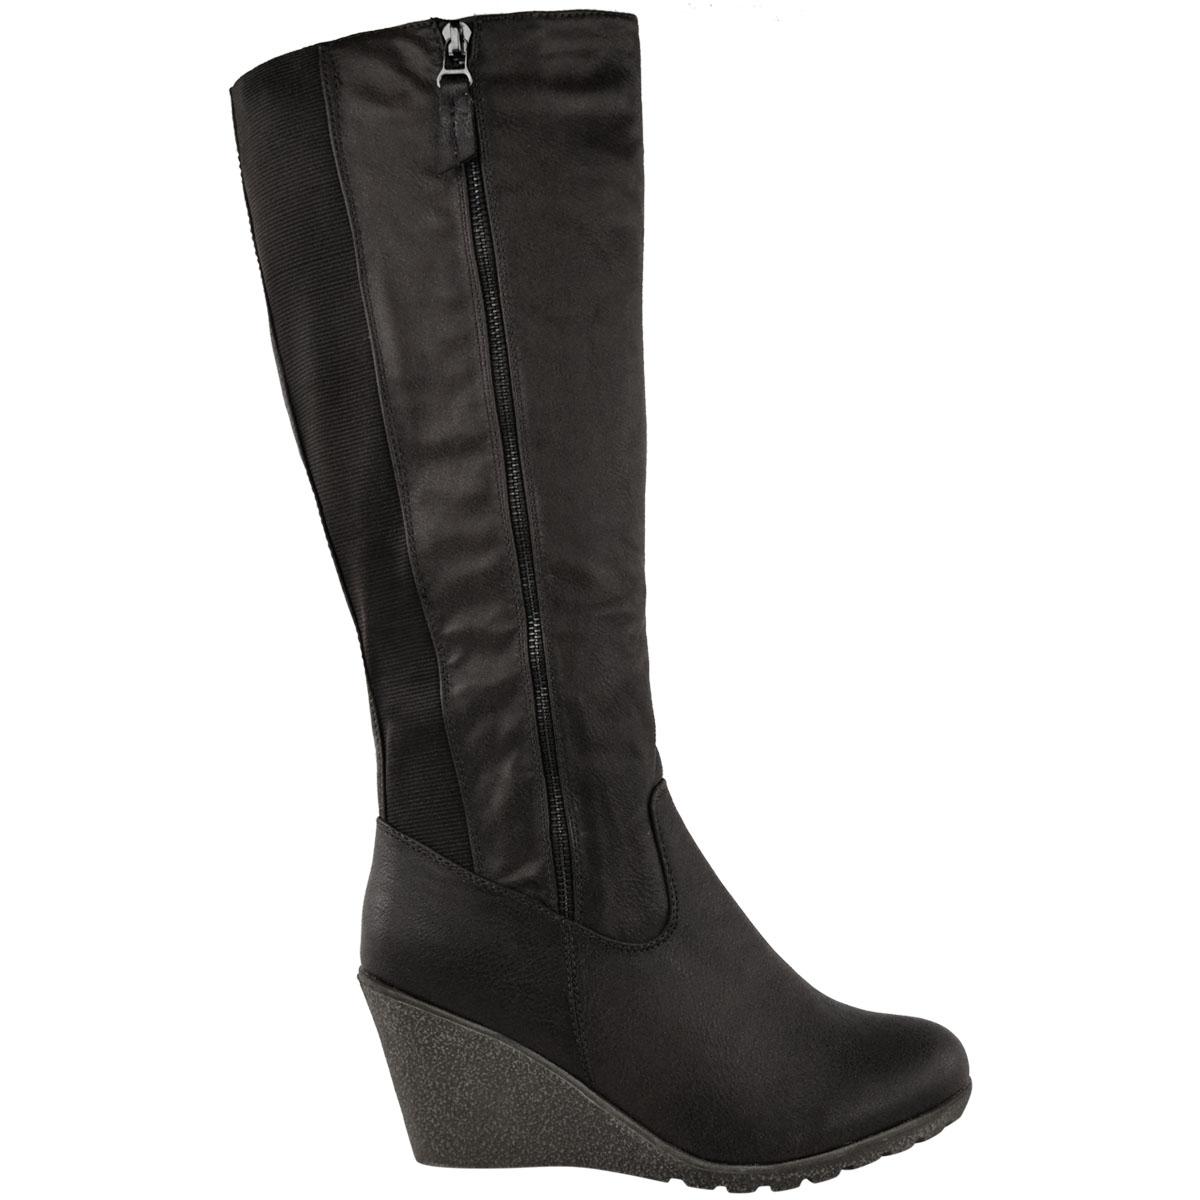 Womens-Ladies-Wedge-Low-Heel-Winter-Knee-Boots-Warm-Faux-Fur-Fleece-Size-UK thumbnail 13